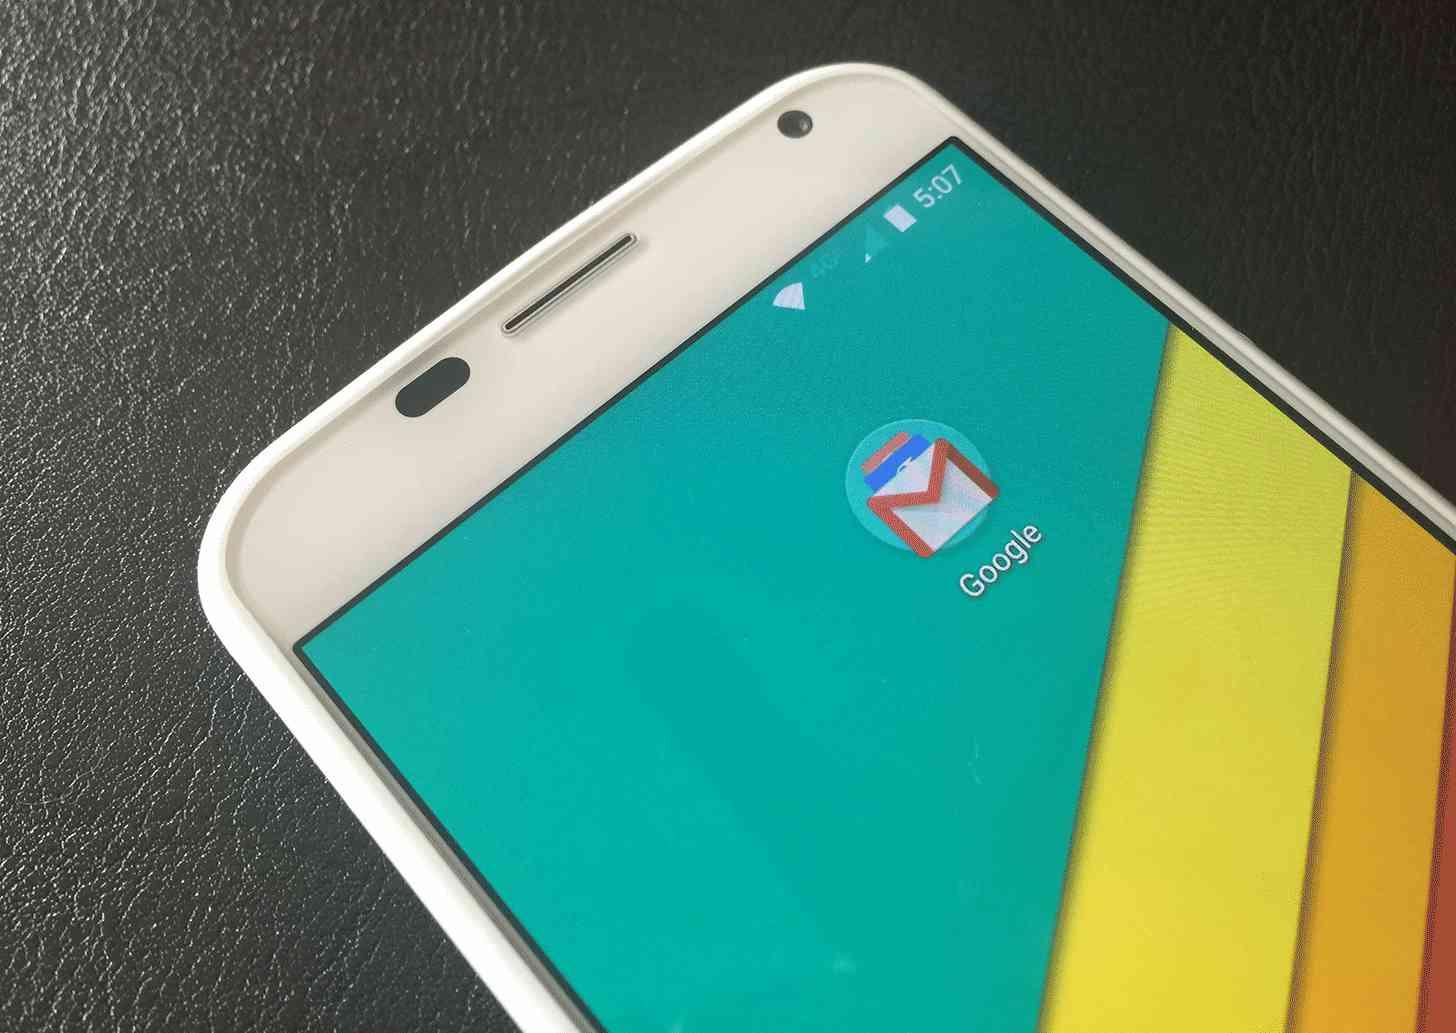 Moto X Google folder